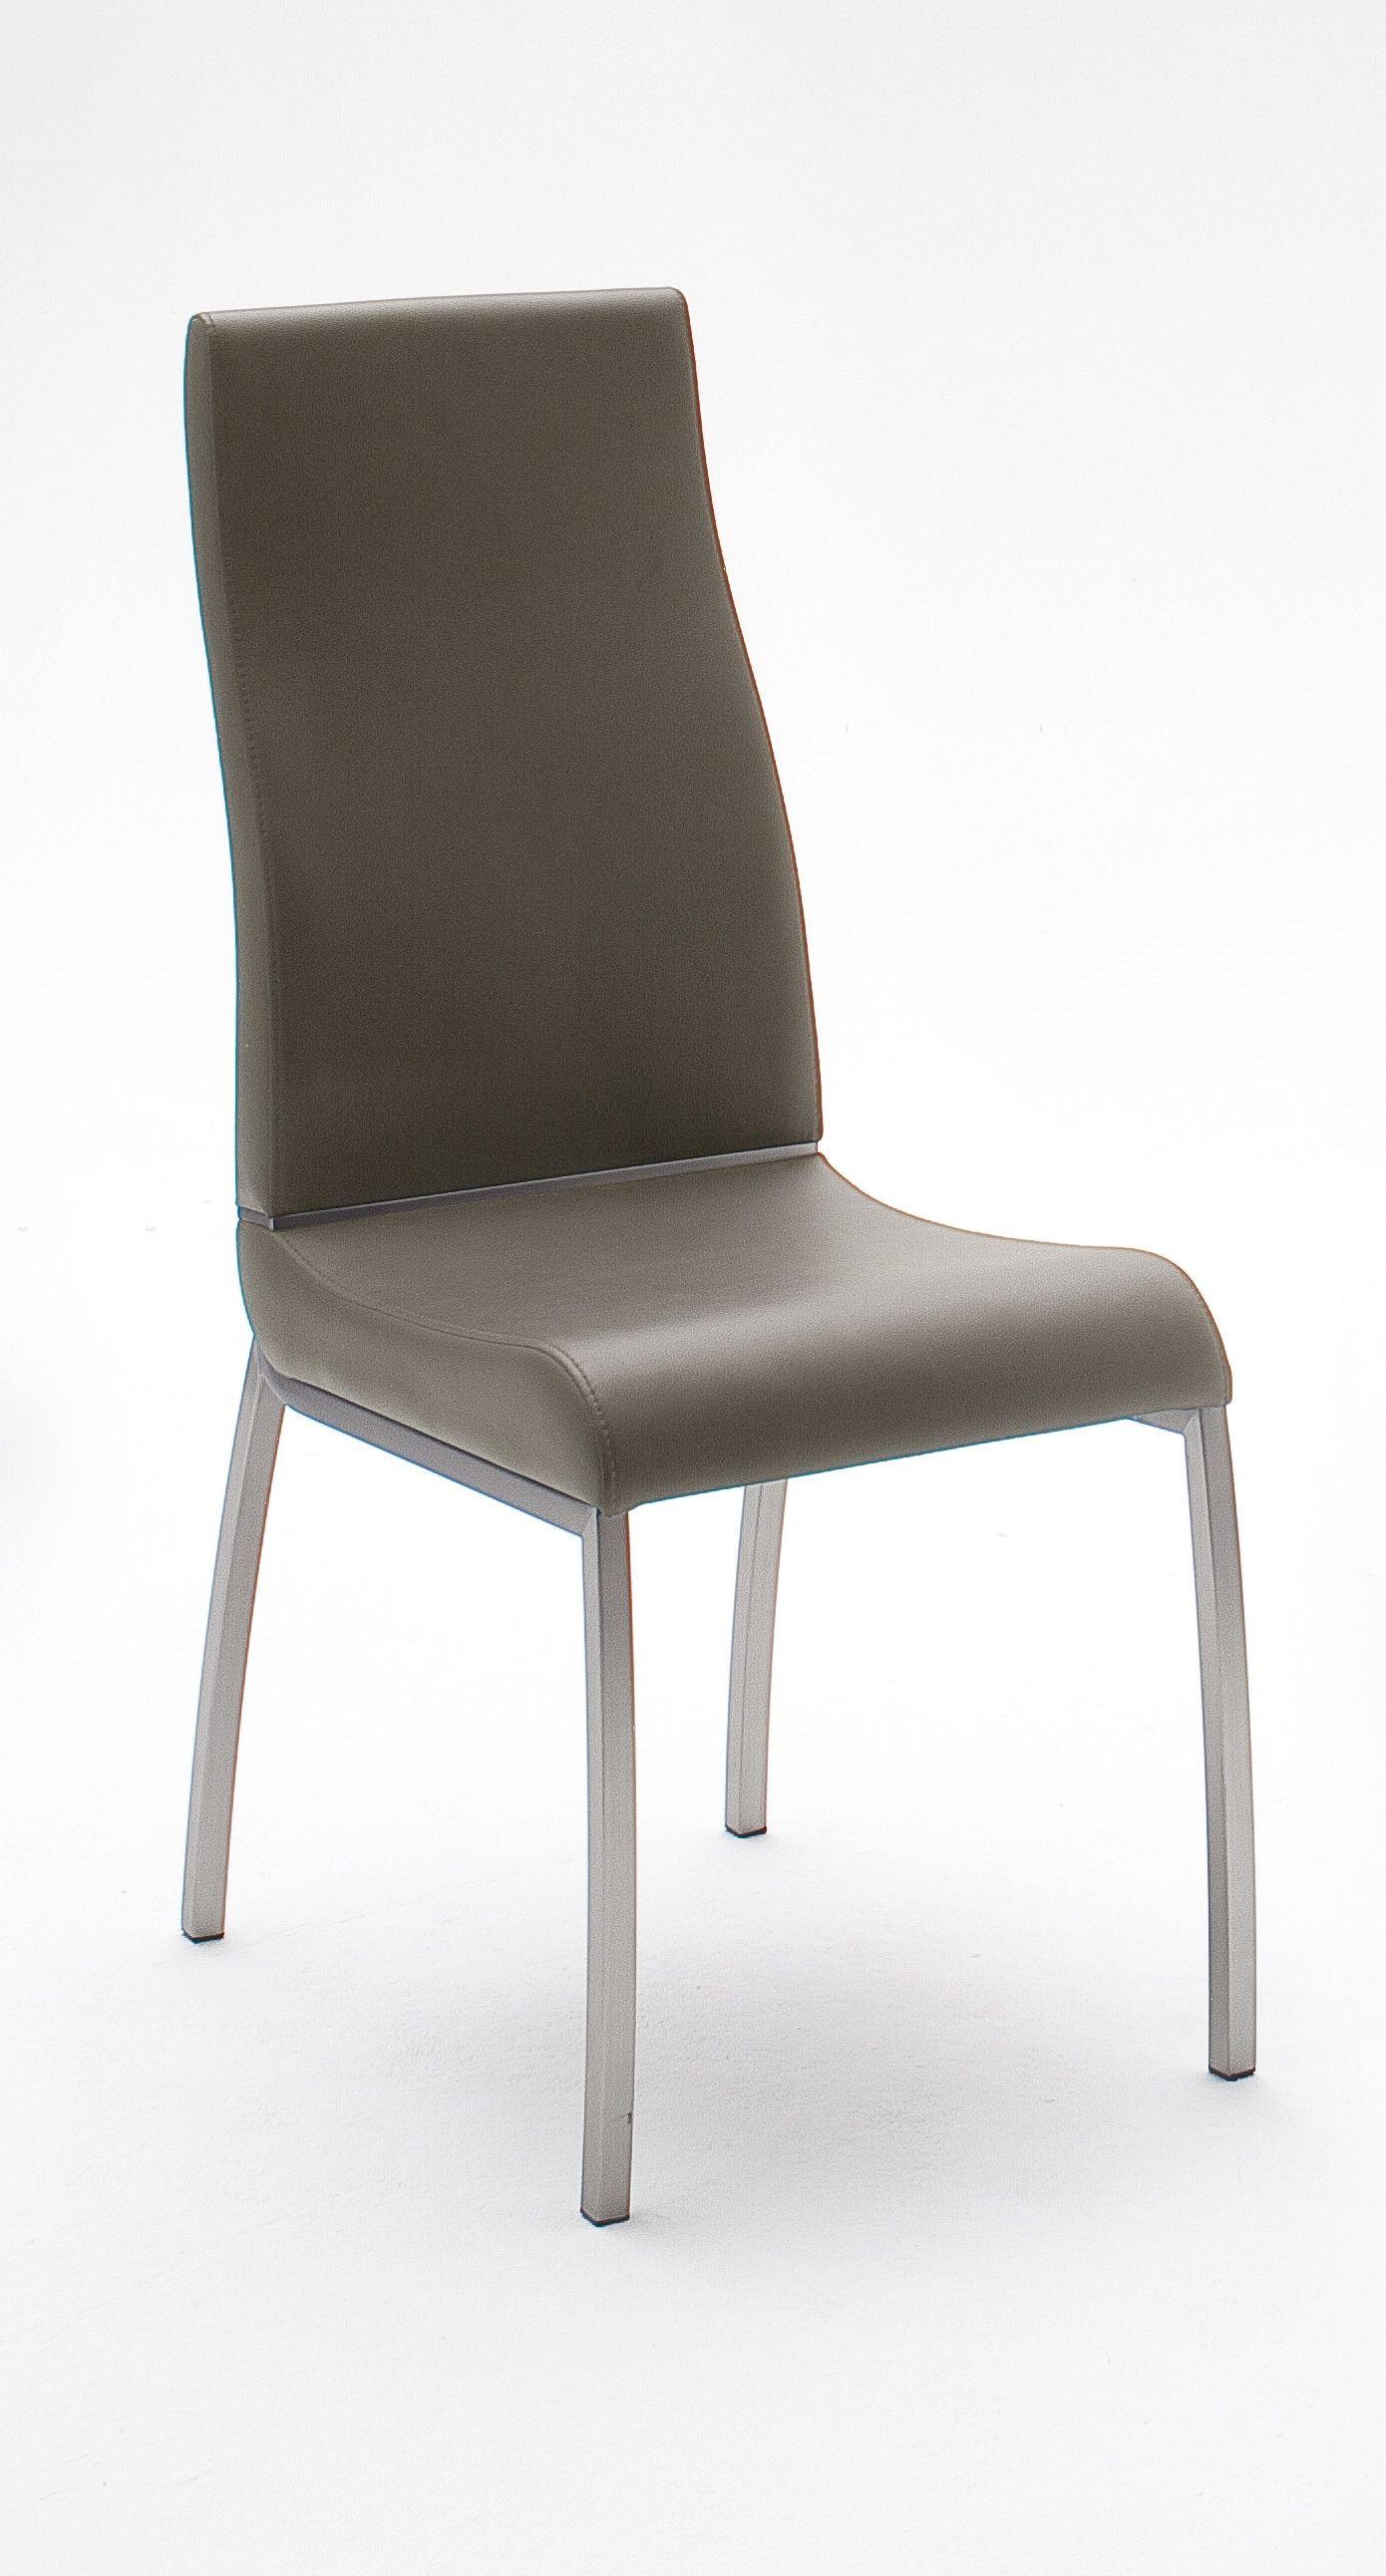 2er Set Stuhl Kunstleder Cappuccino Woody 41 Edelstahl neutral Jetzt bestellen unter s